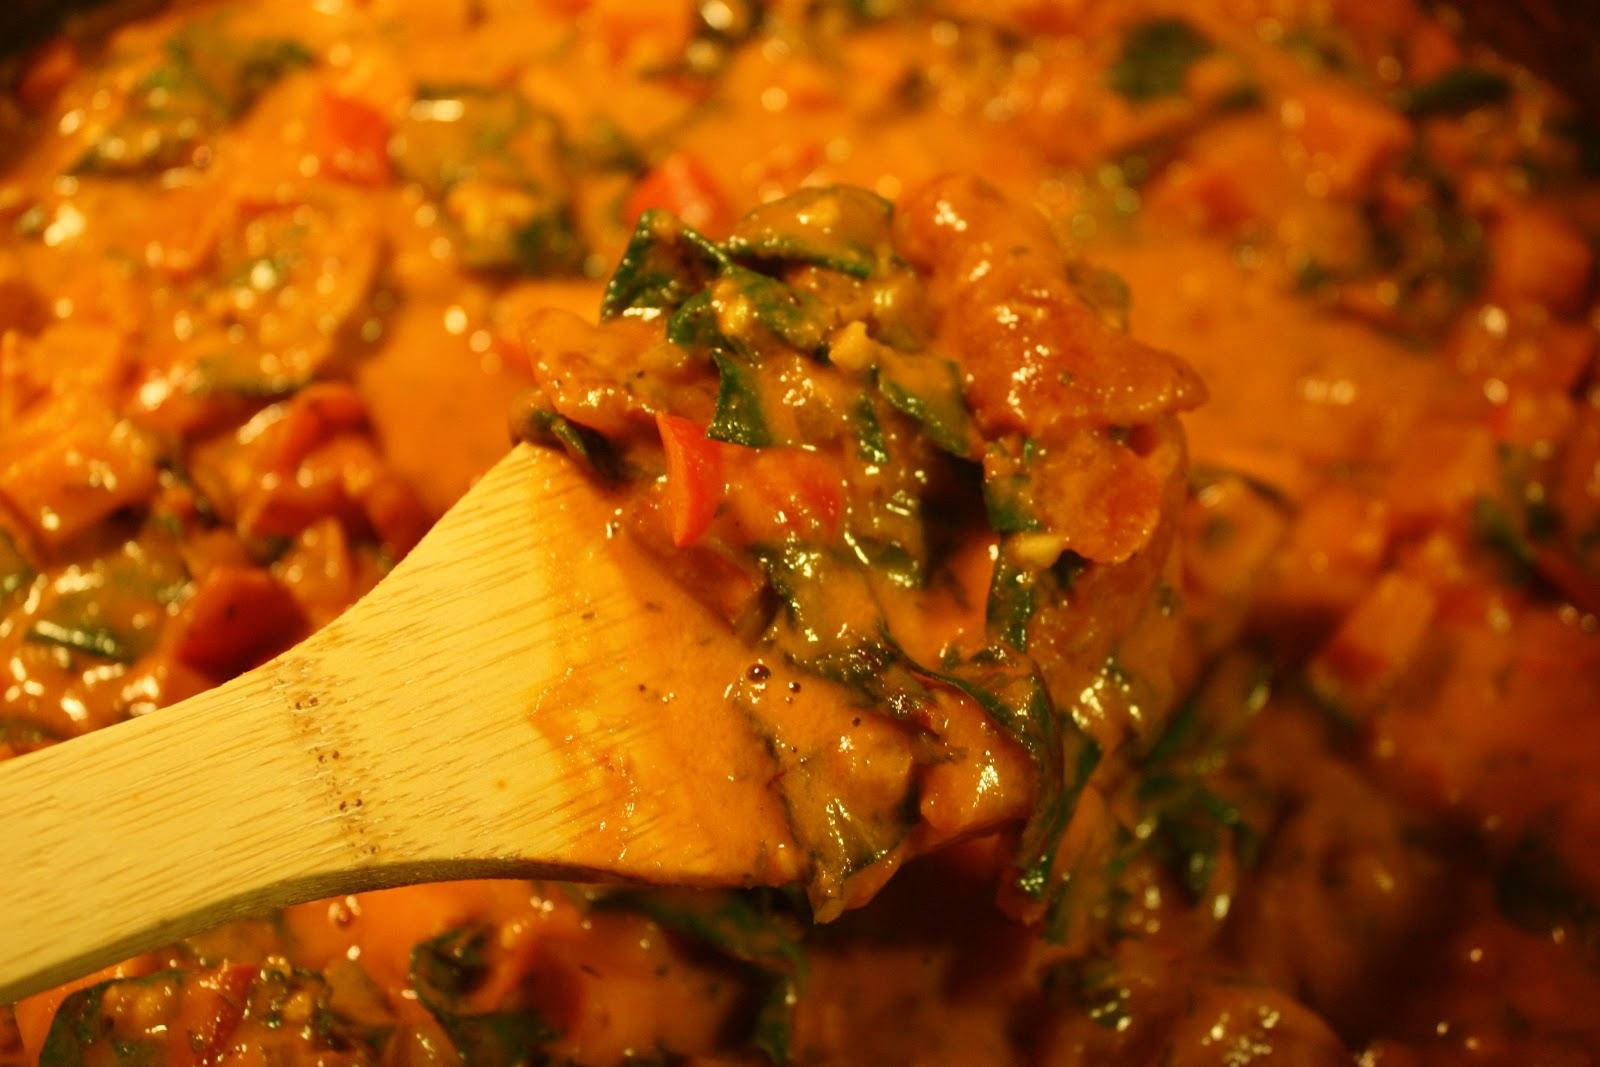 Hopeful: Weekday Winner: West African Groundnut Stew